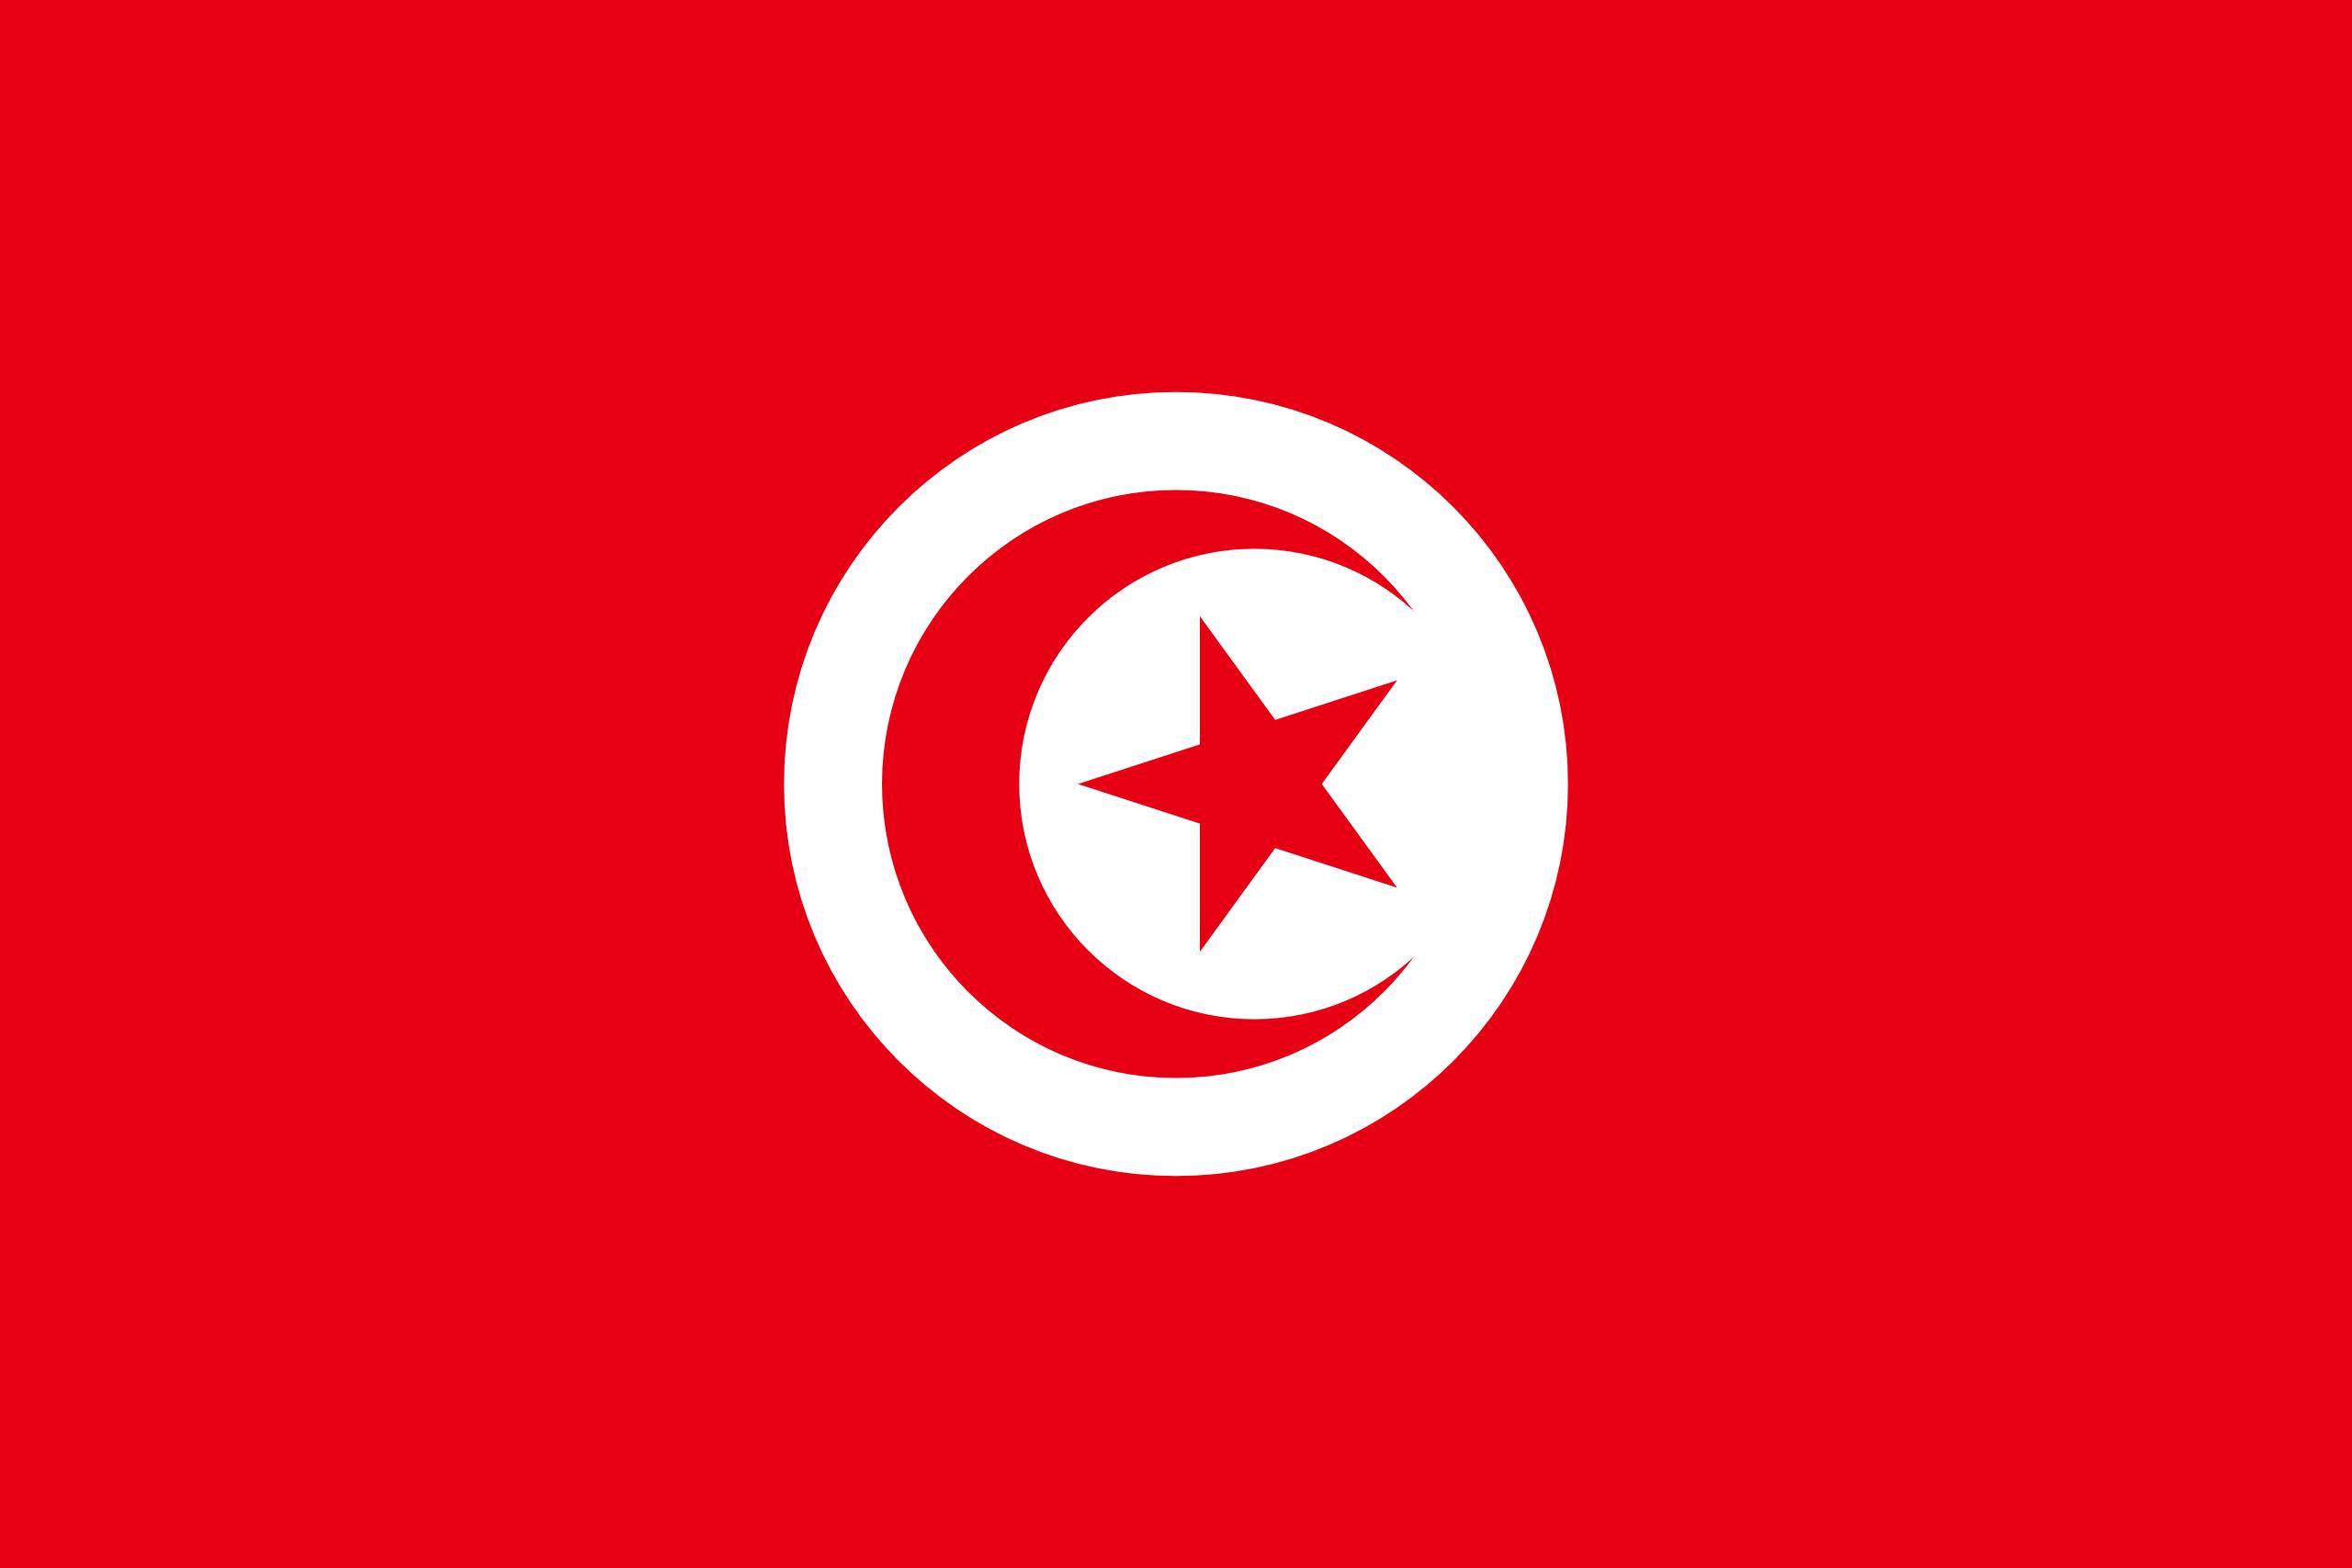 túnez, país, emblema, insignia, символ - Обои HD - Профессор falken.com